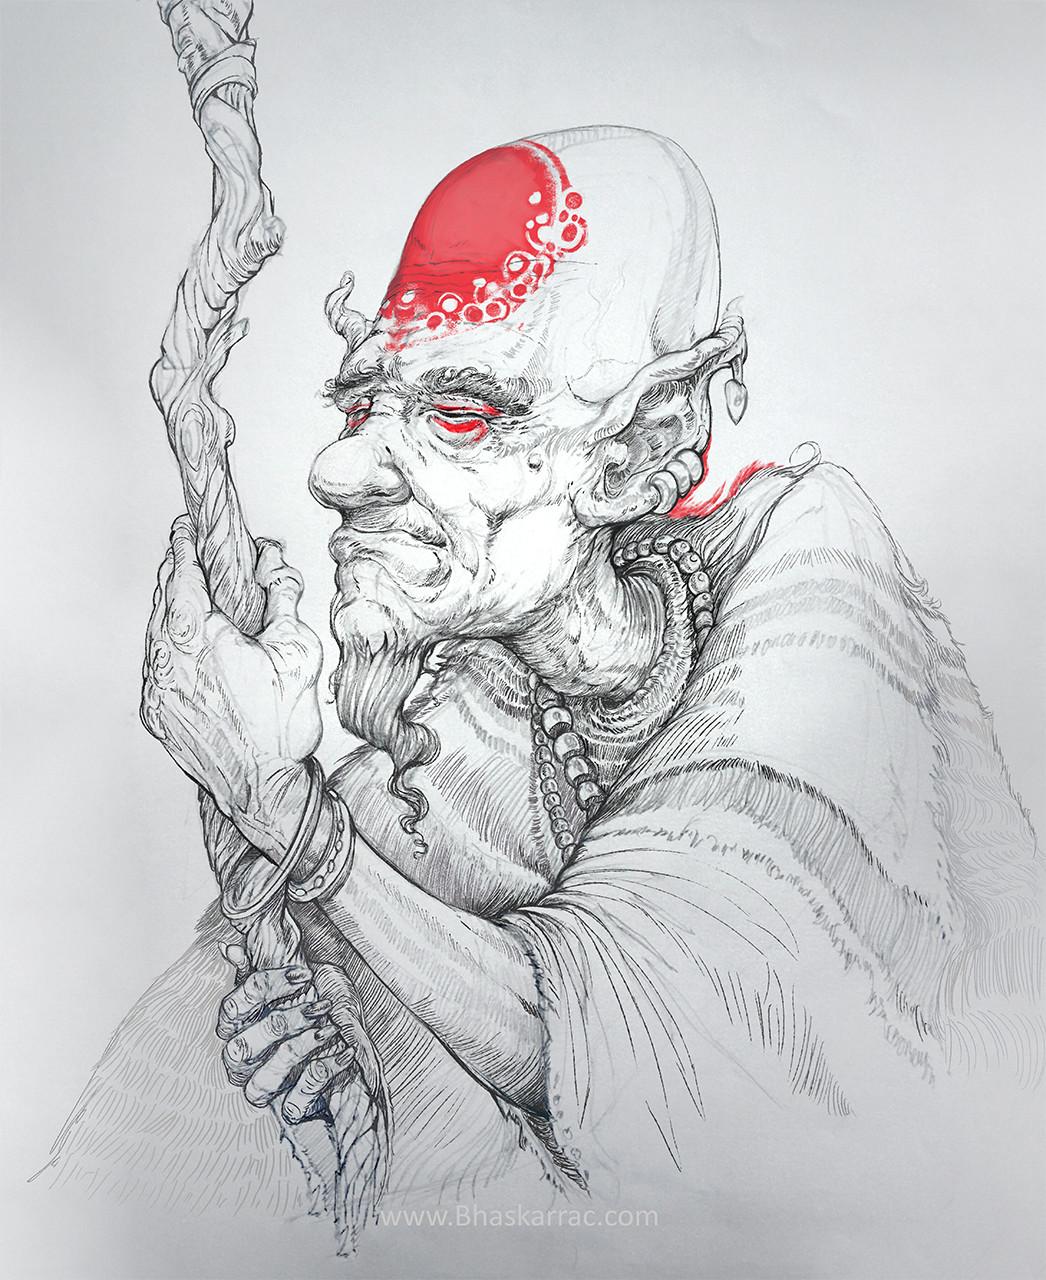 Shaman sketch